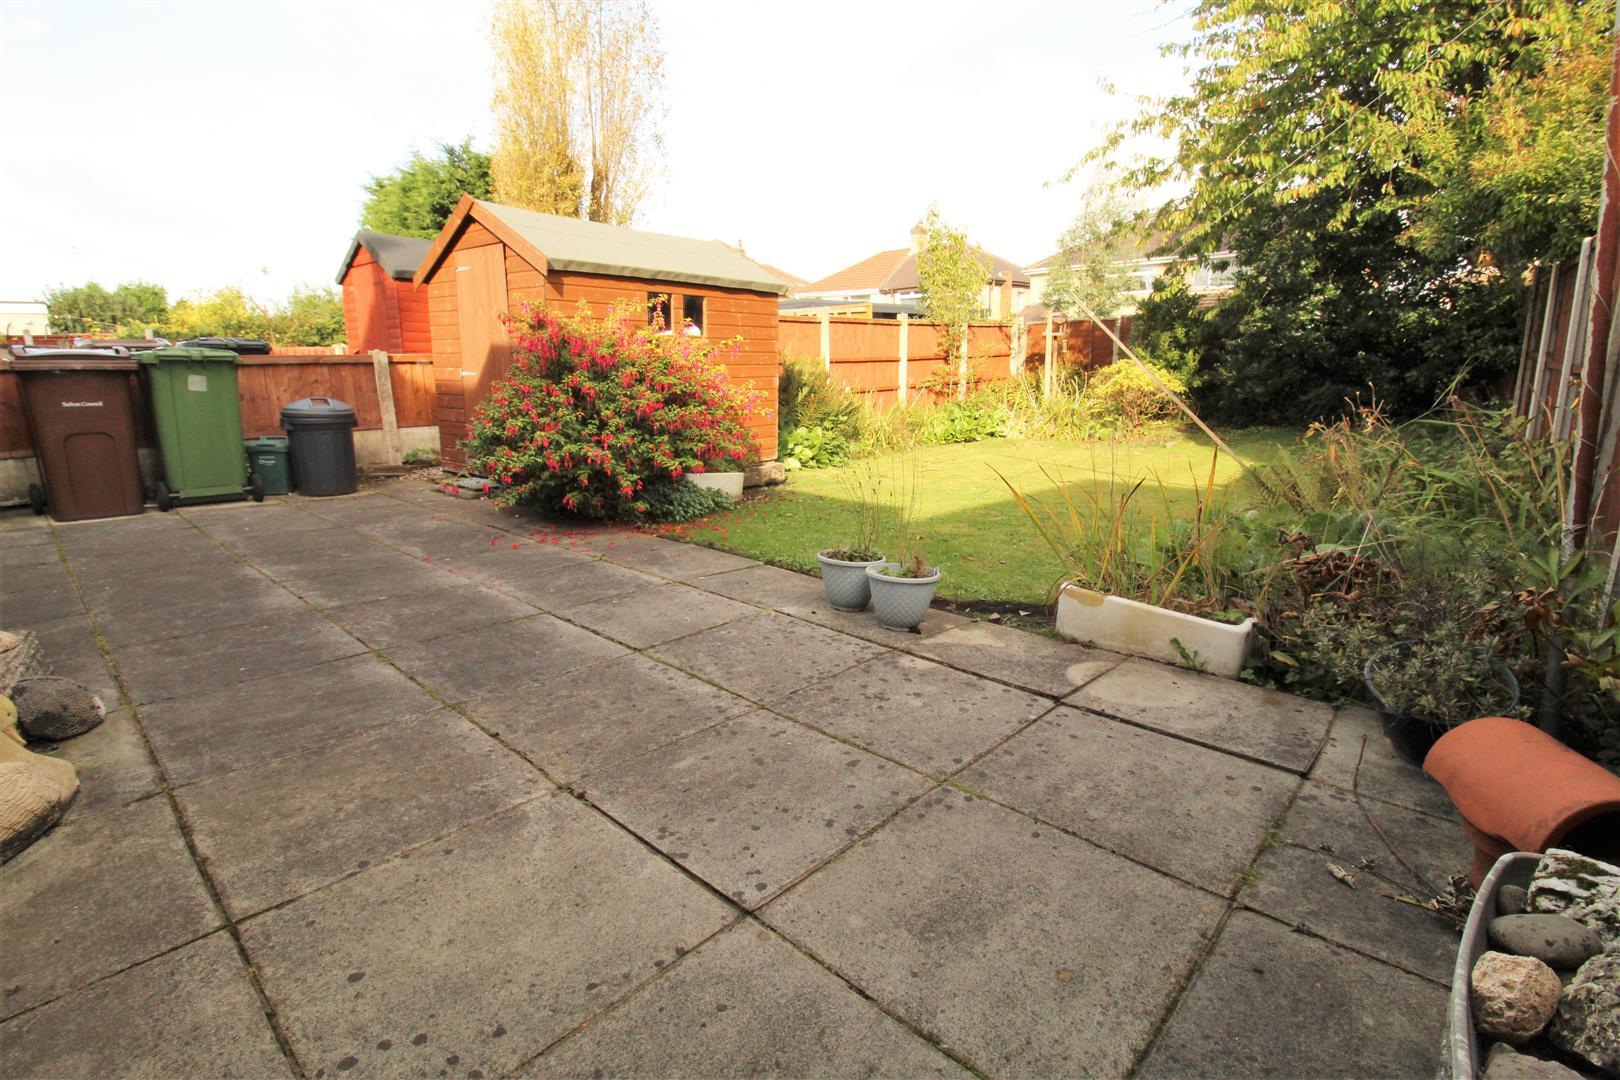 3 Bedrooms, House - Semi-Detached, Radley Drive, Liverpool